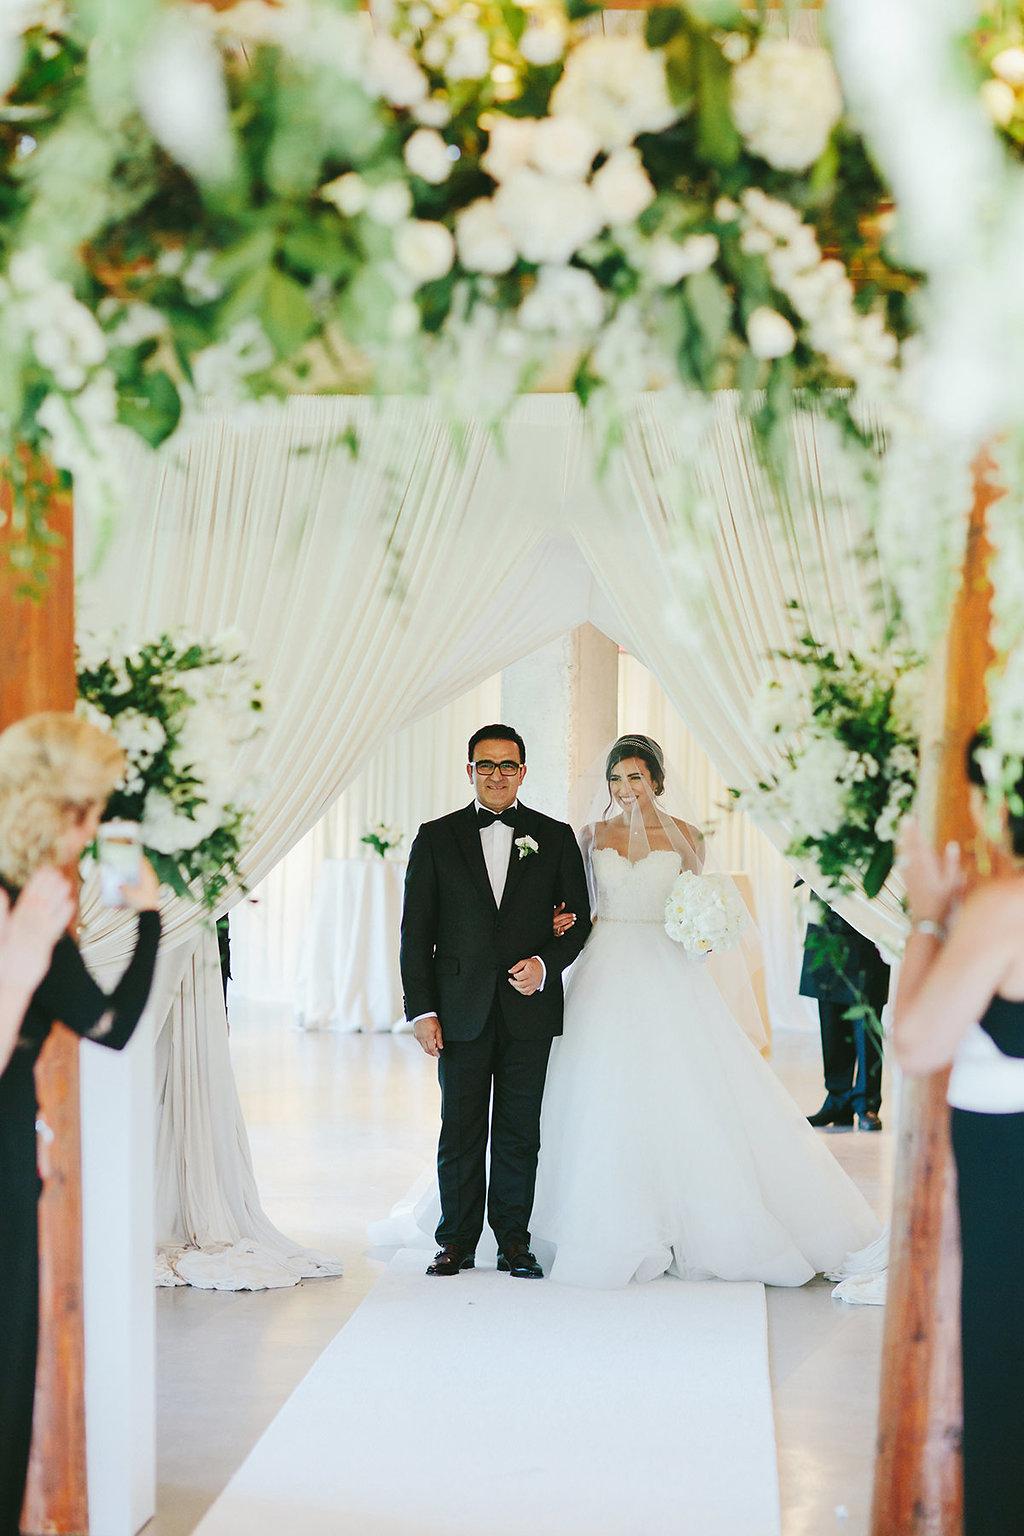 bridal processionals - photo by Melia Lucida http://ruffledblog.com/elegant-canadian-wedding-with-greenery